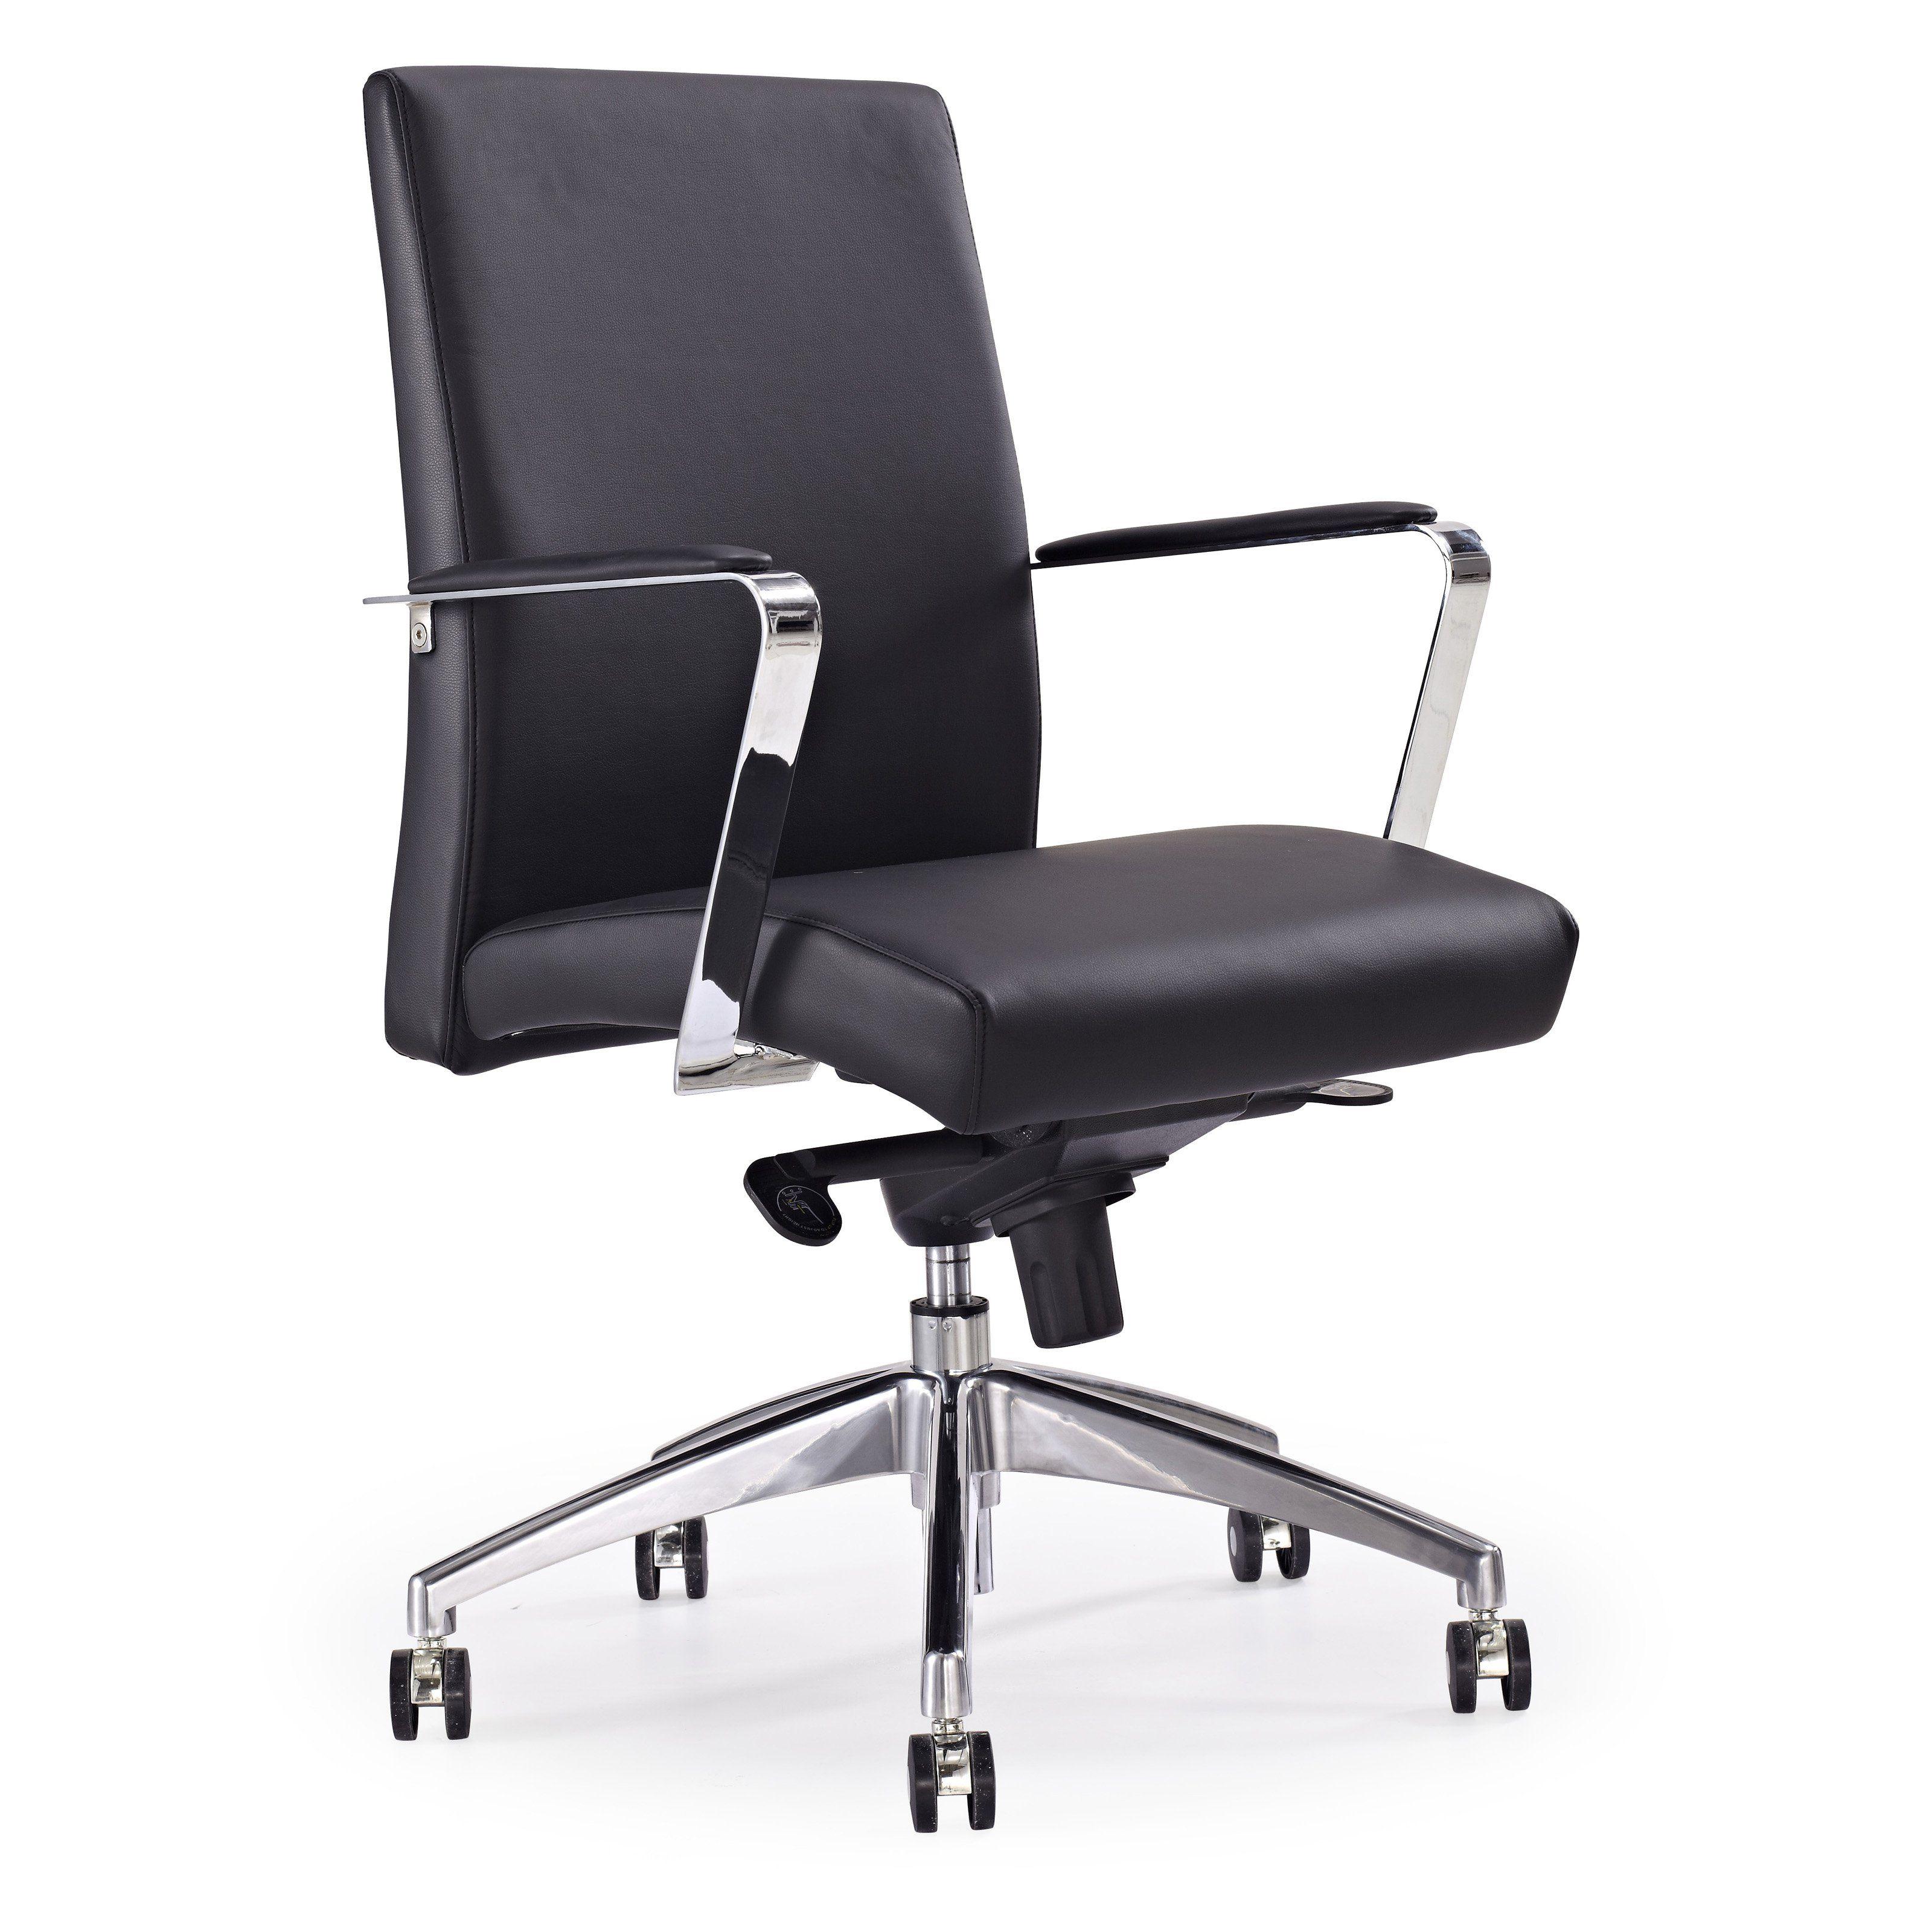 whiteline clemson visitor office chair vc 1176p wht products rh pinterest com